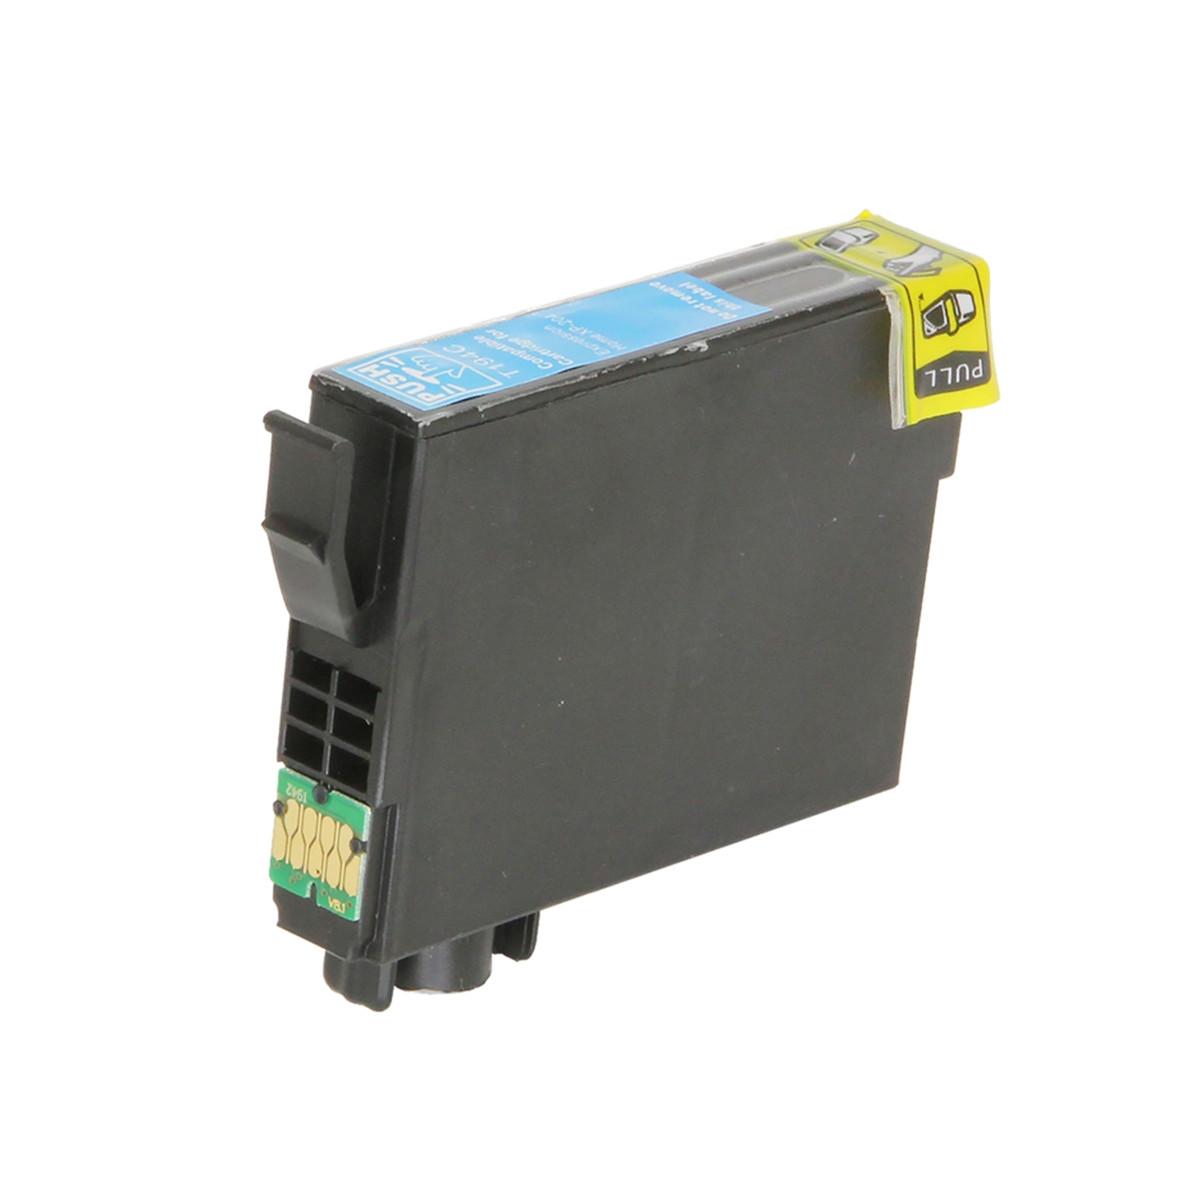 Cartucho de Tinta Compatível com Epson T194 T194220 T1942 Ciano   XP214 XP204 XP 204   6ml